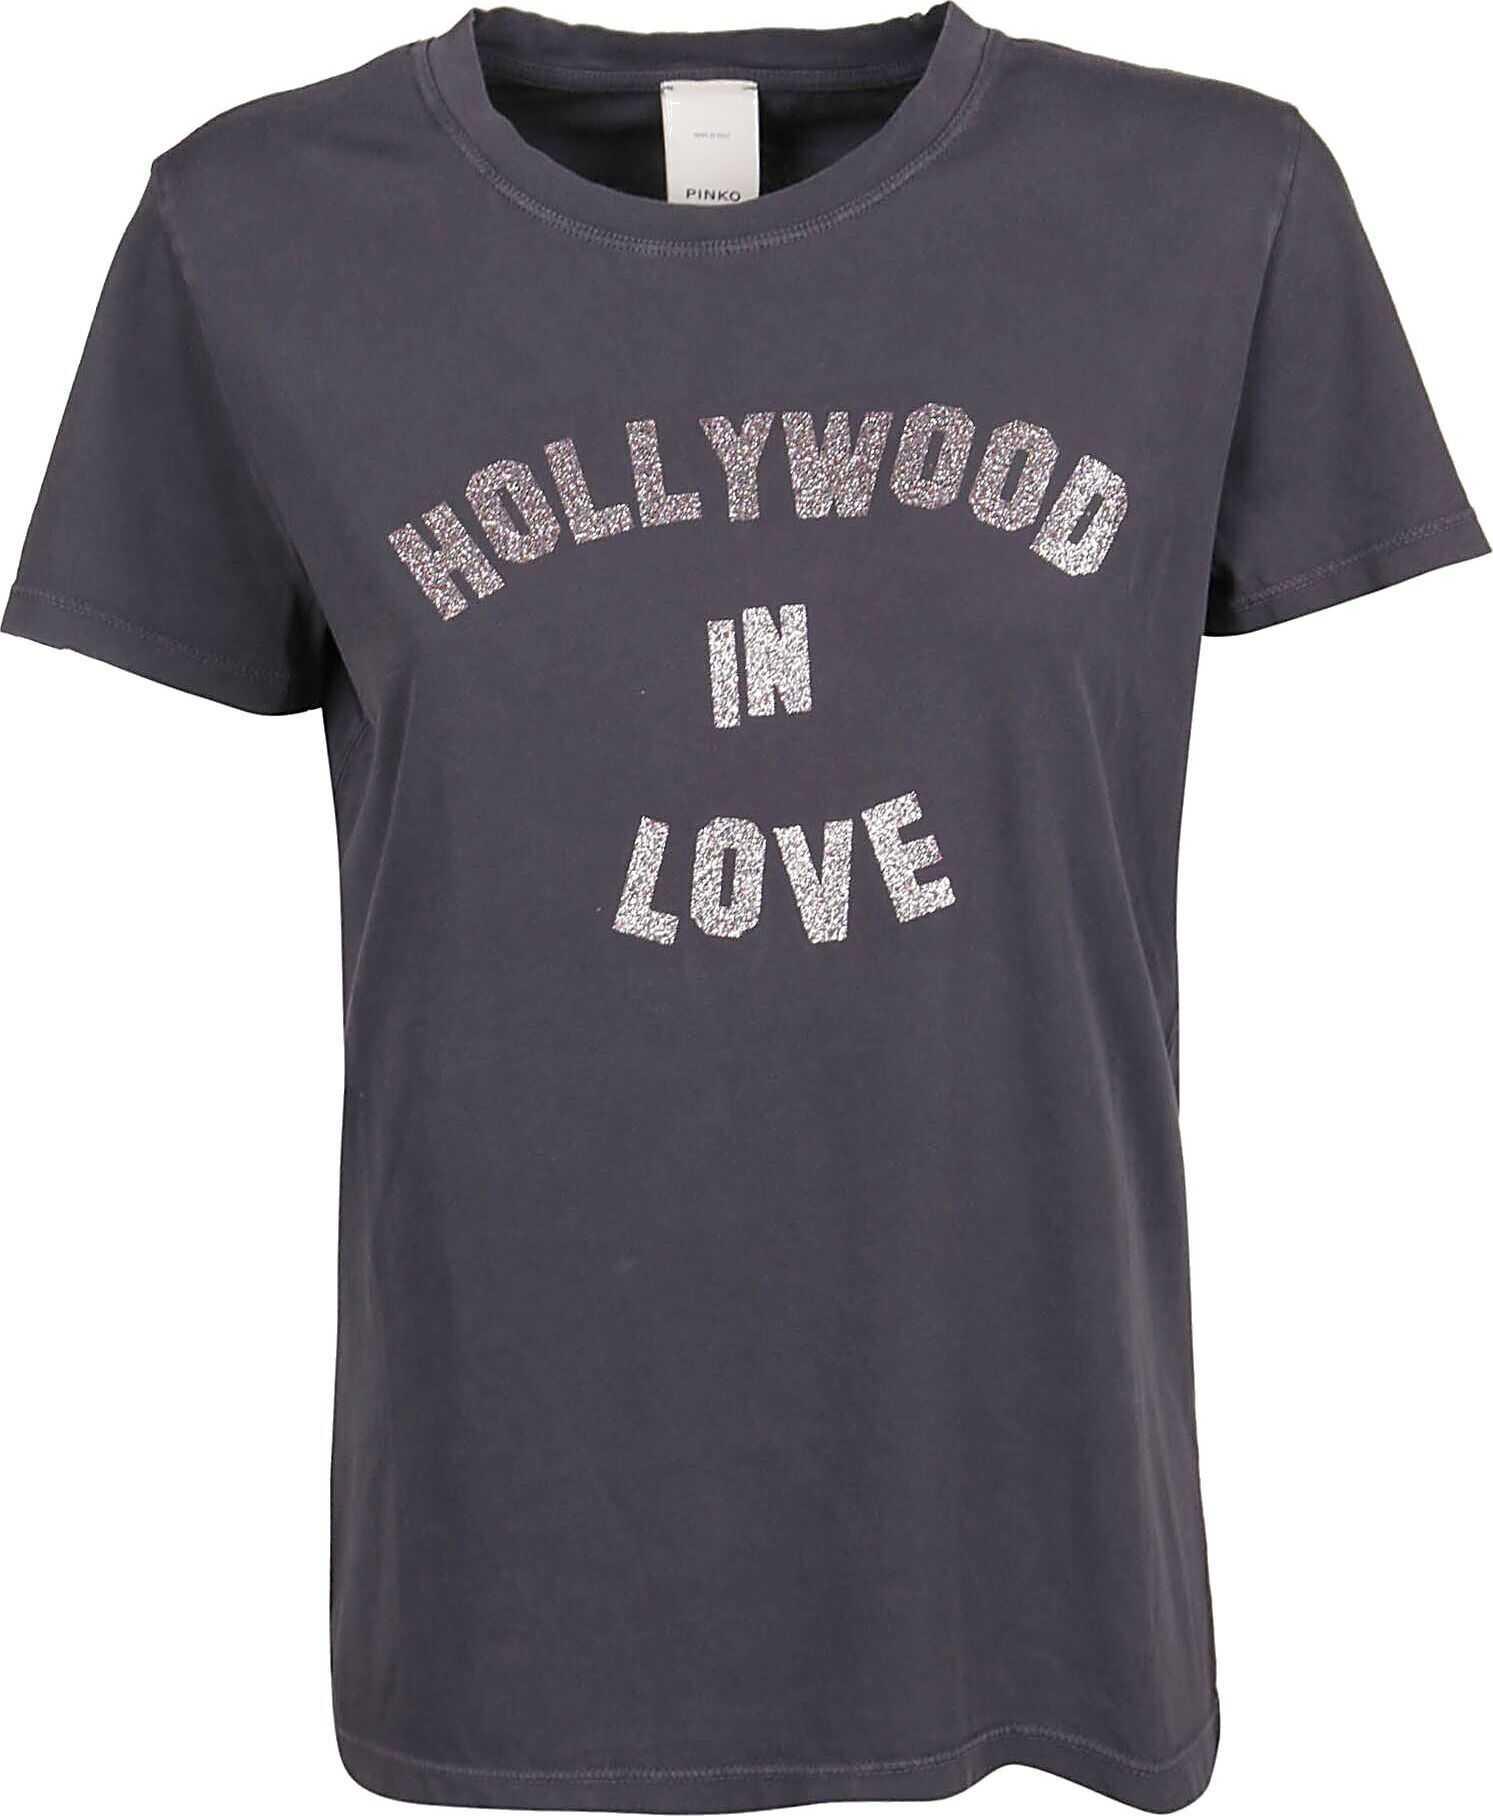 Pinko Cotton T-Shirt BLACK